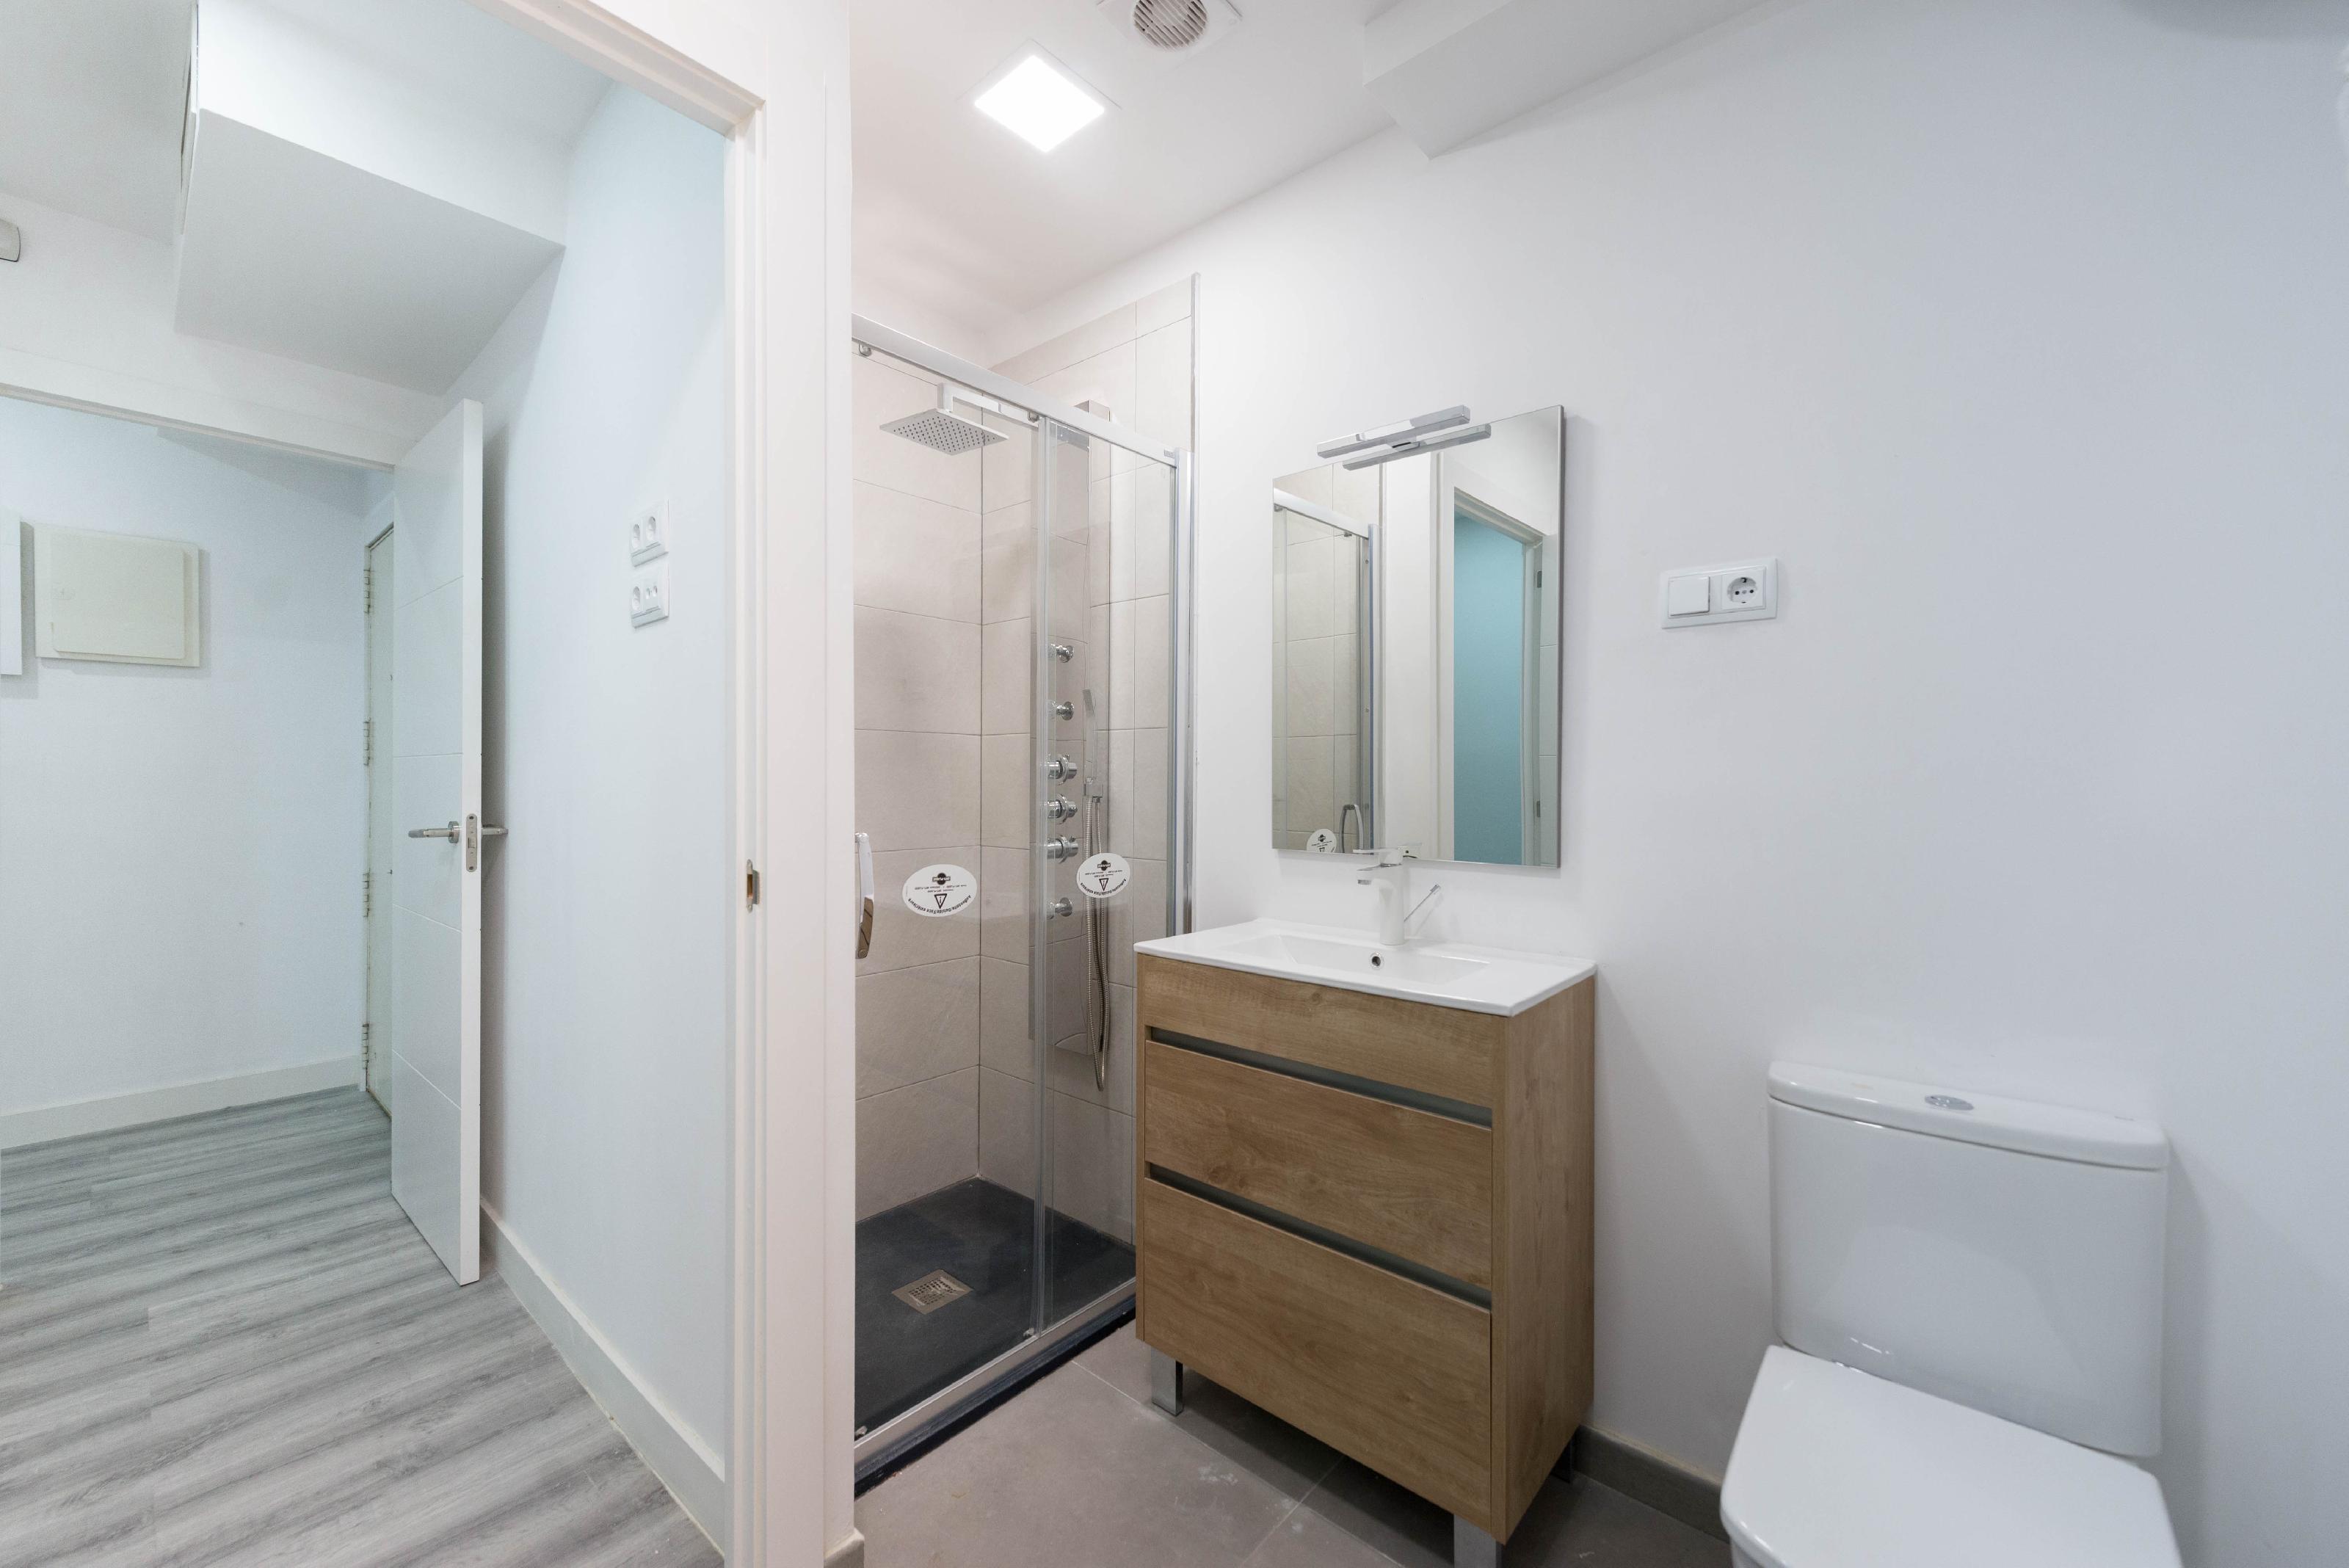 242980 Flat for sale in Eixample, Sagrada Familia 19